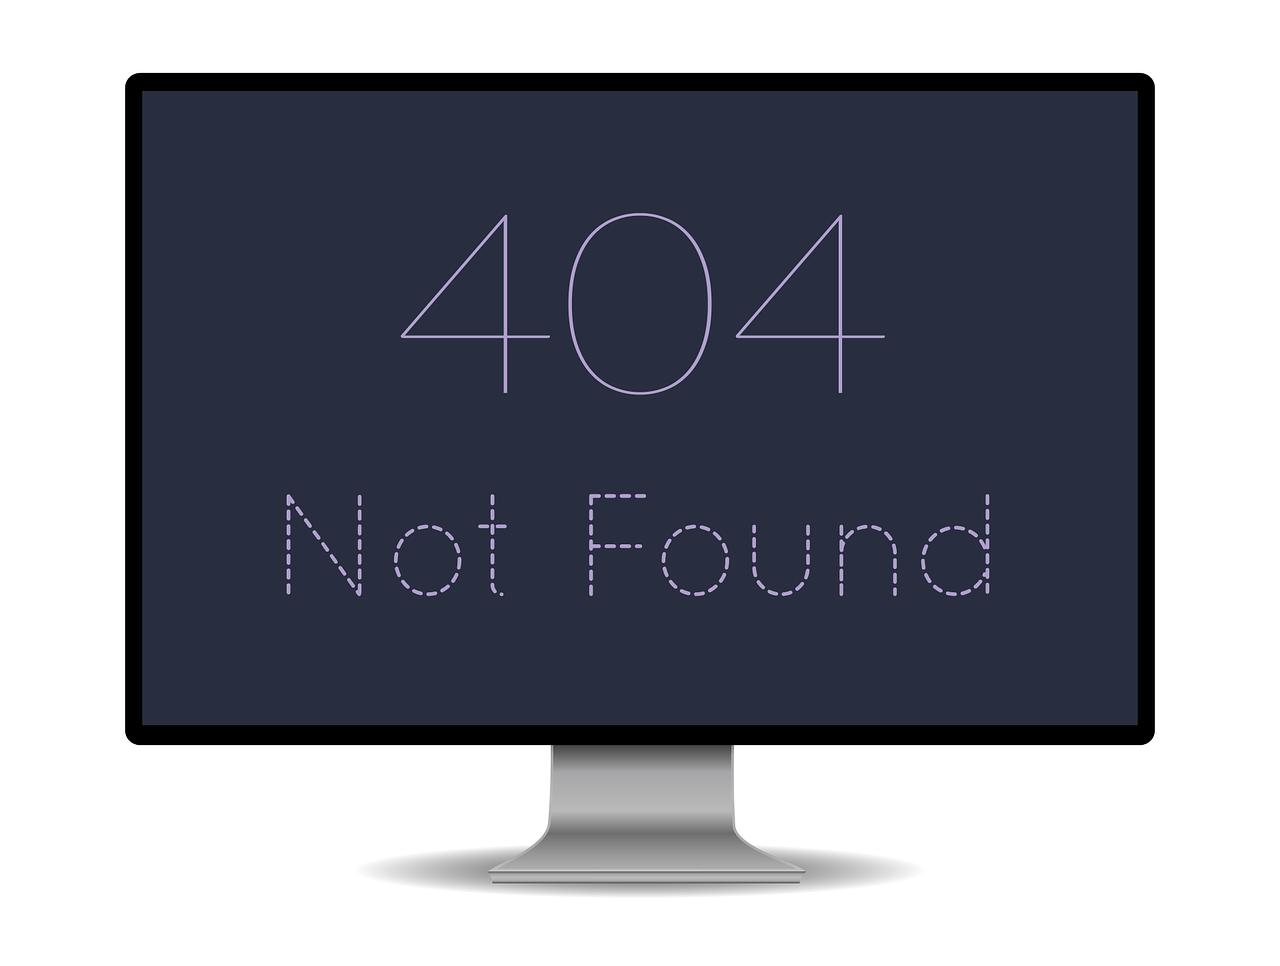 404 felermeldung